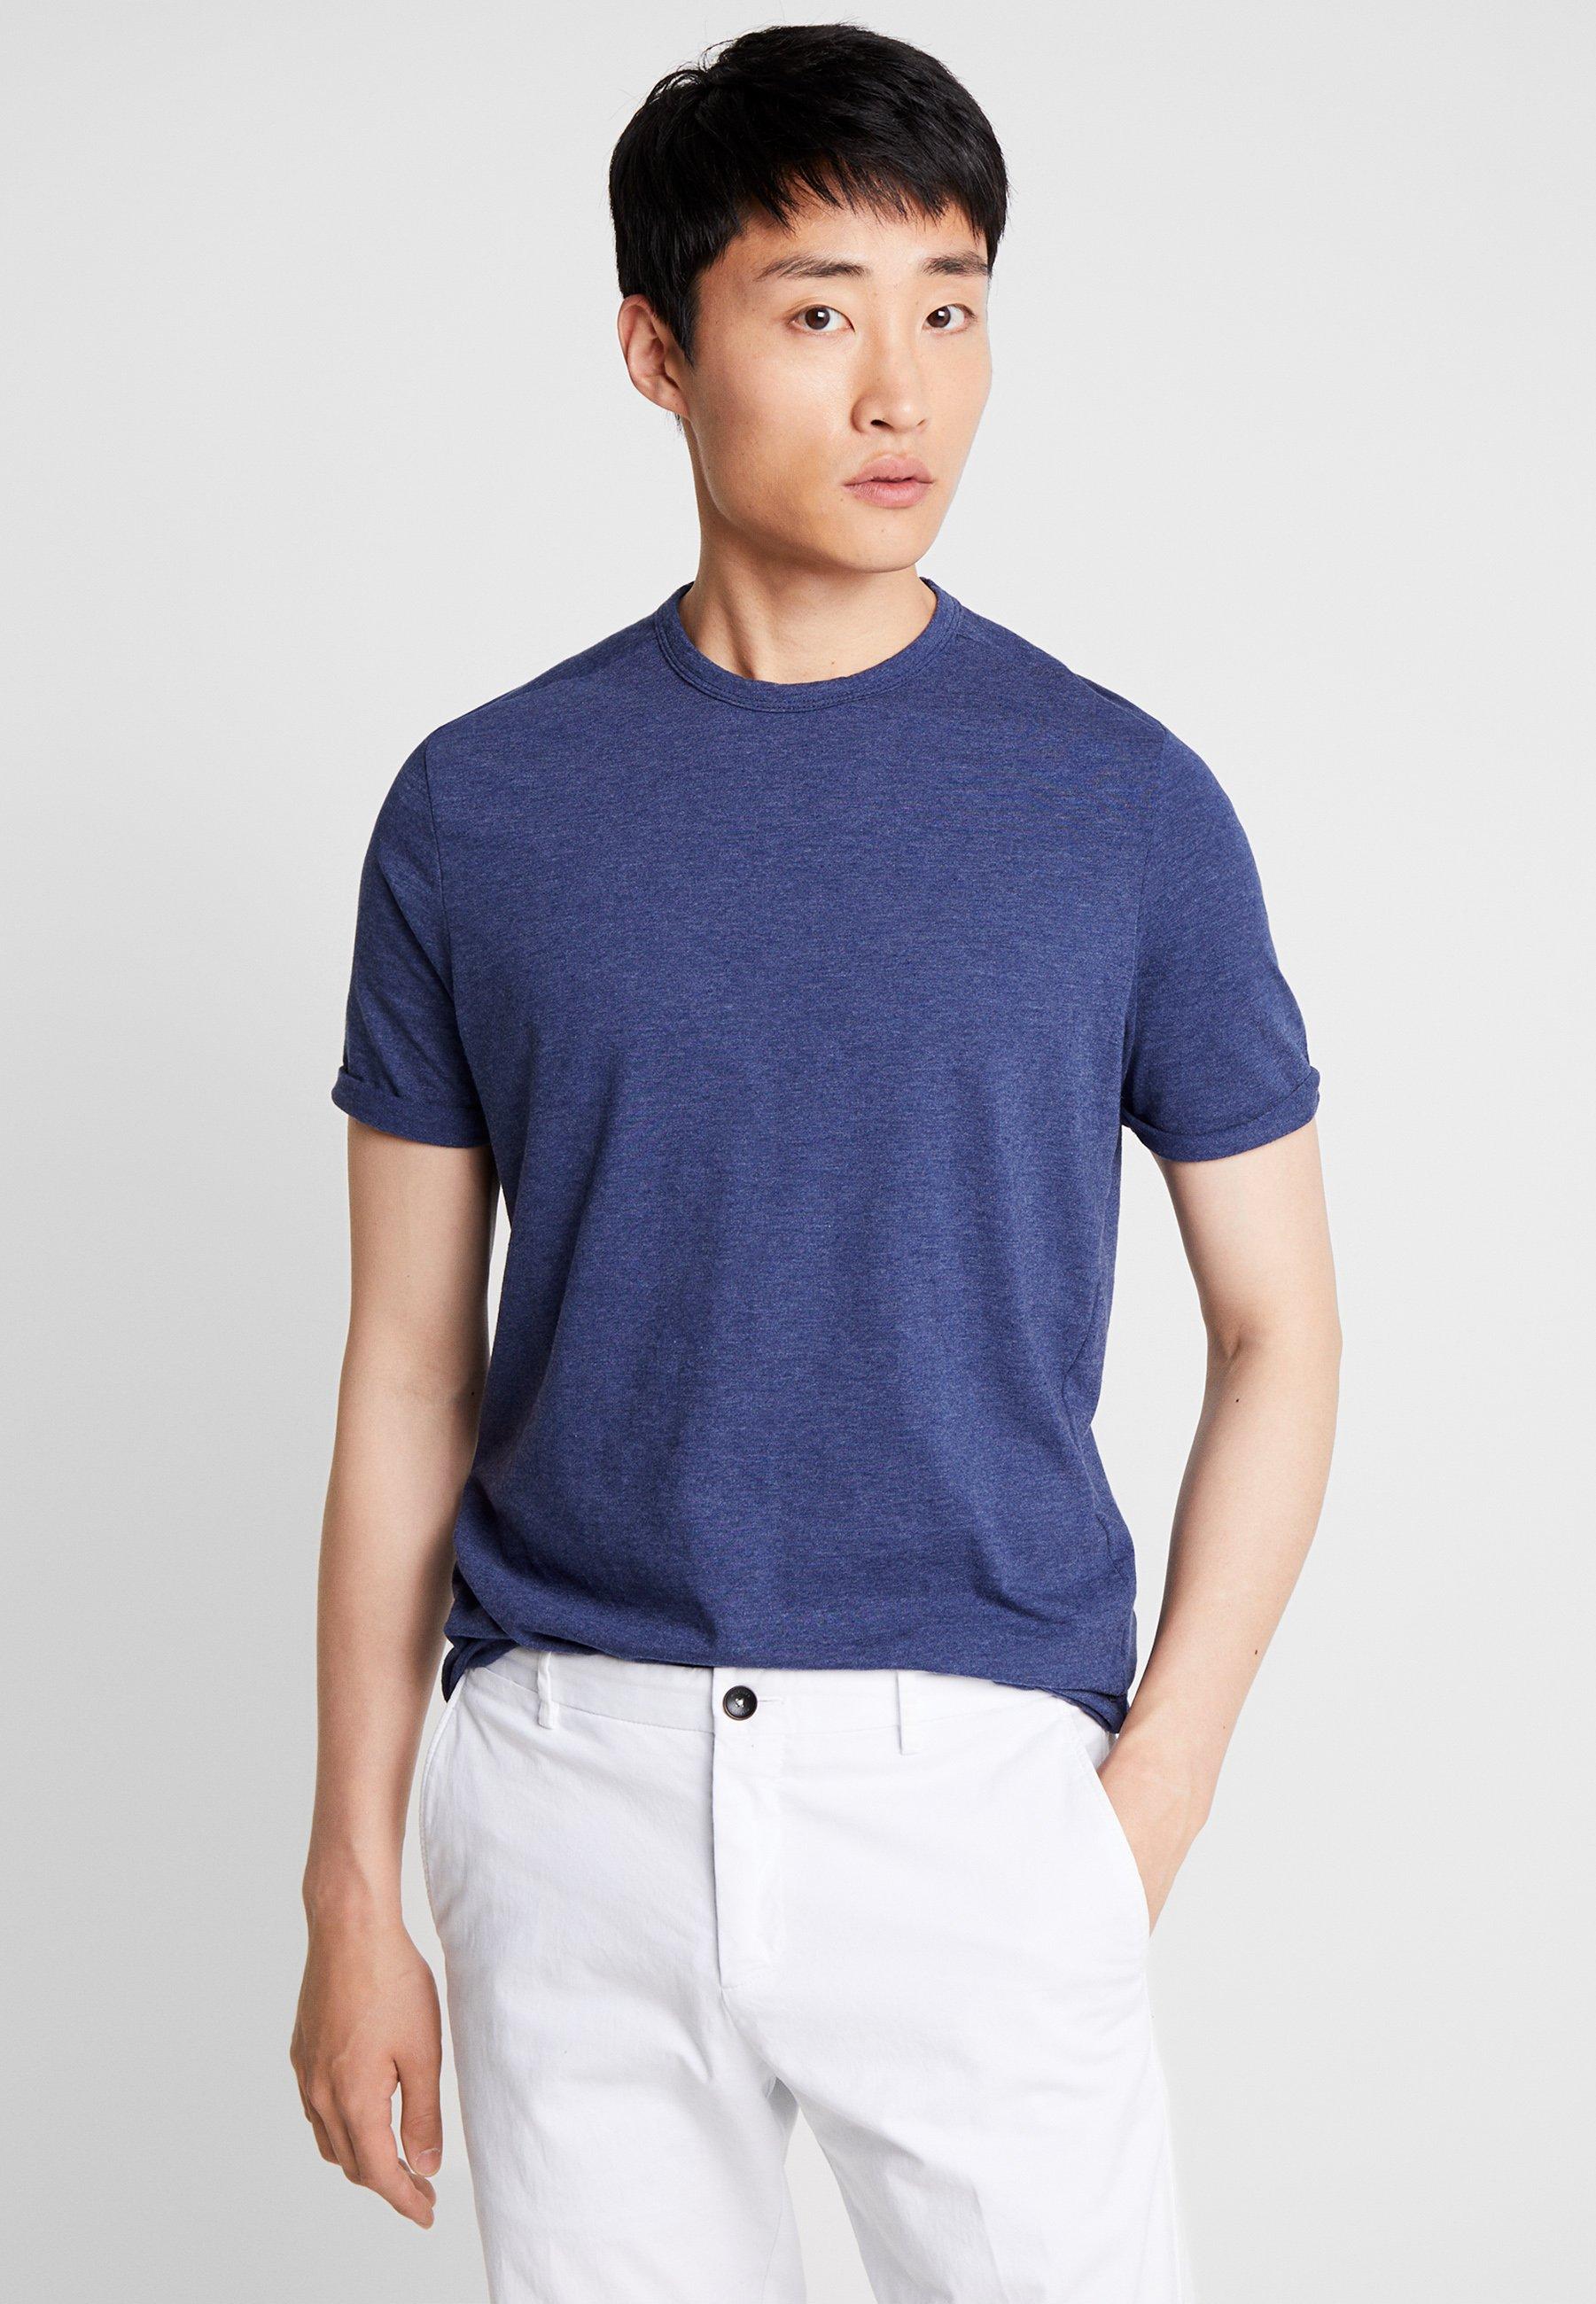 Springfield Springfield Blues shirt BasicT shirt Basique BasicT yv6gIYbf7